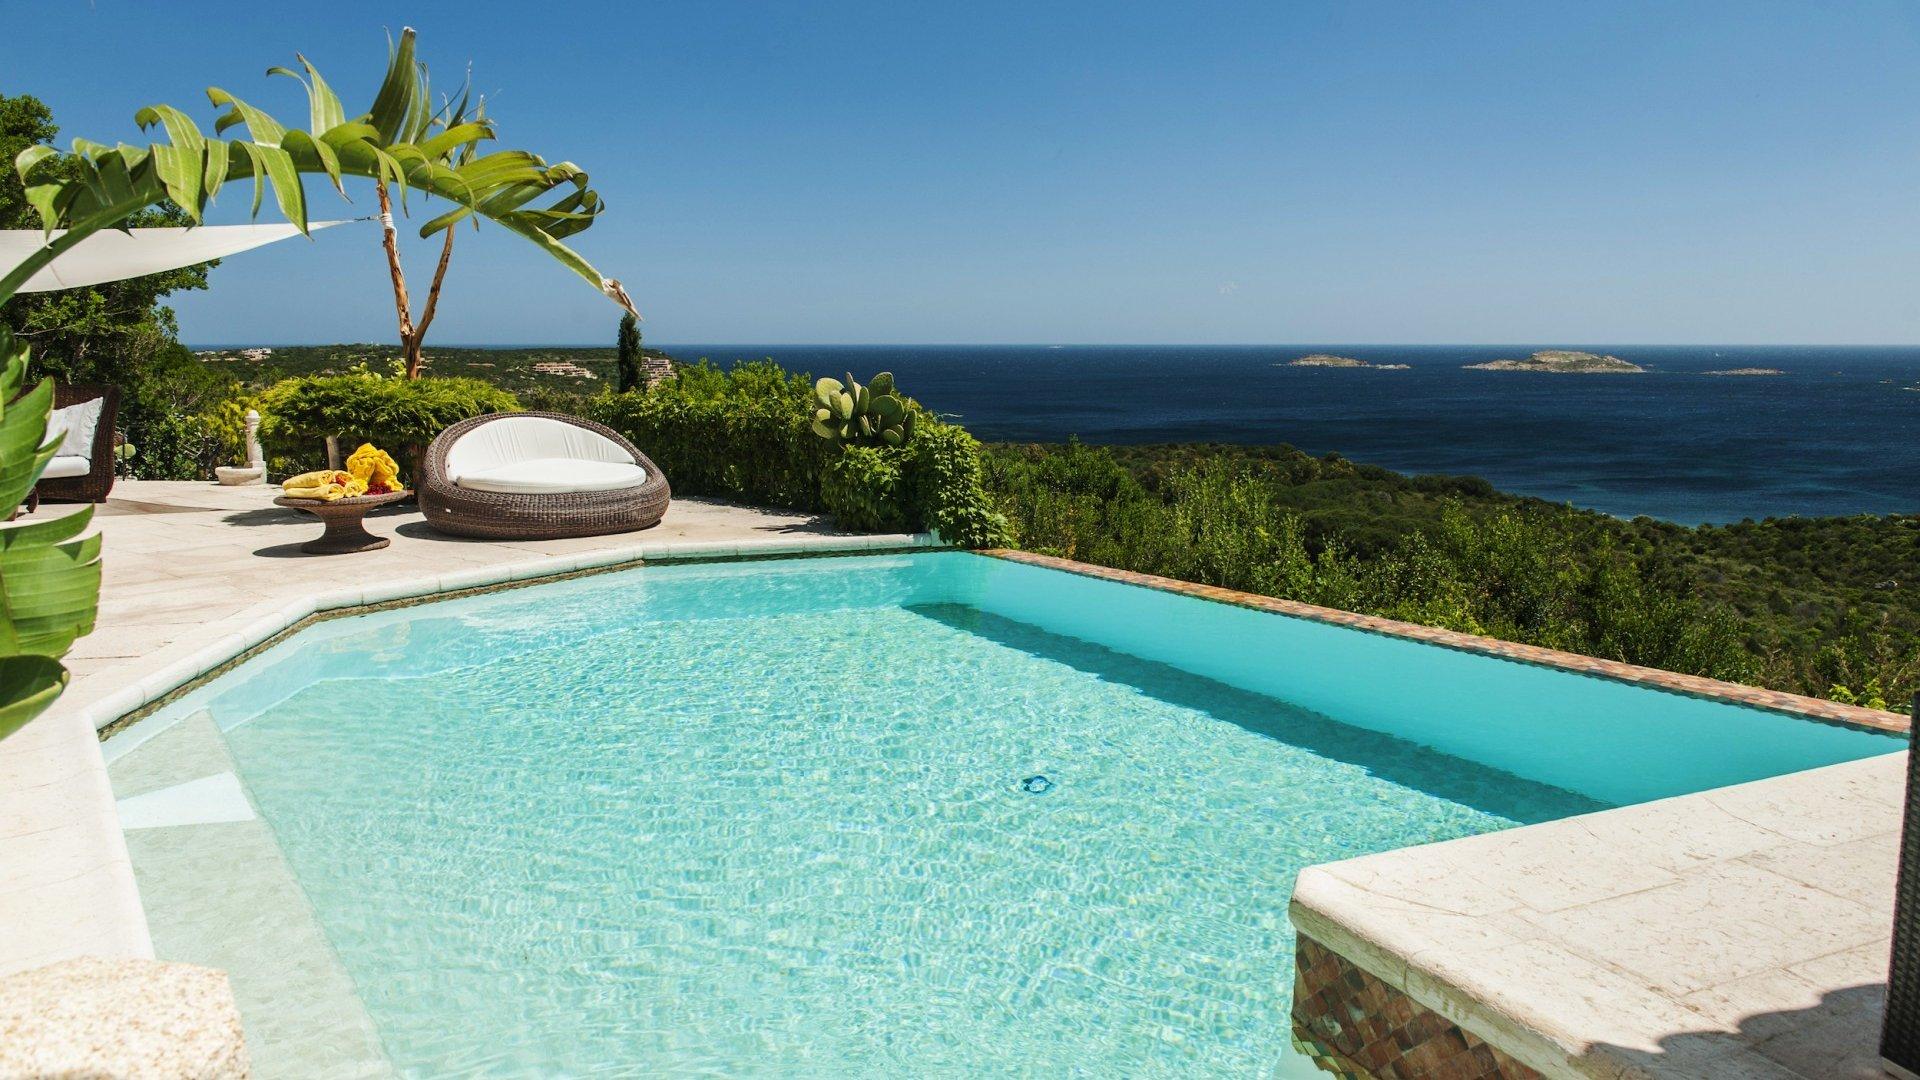 candida-luxury-villa-rental-sardinia-smeralda-coast-porto-cervo